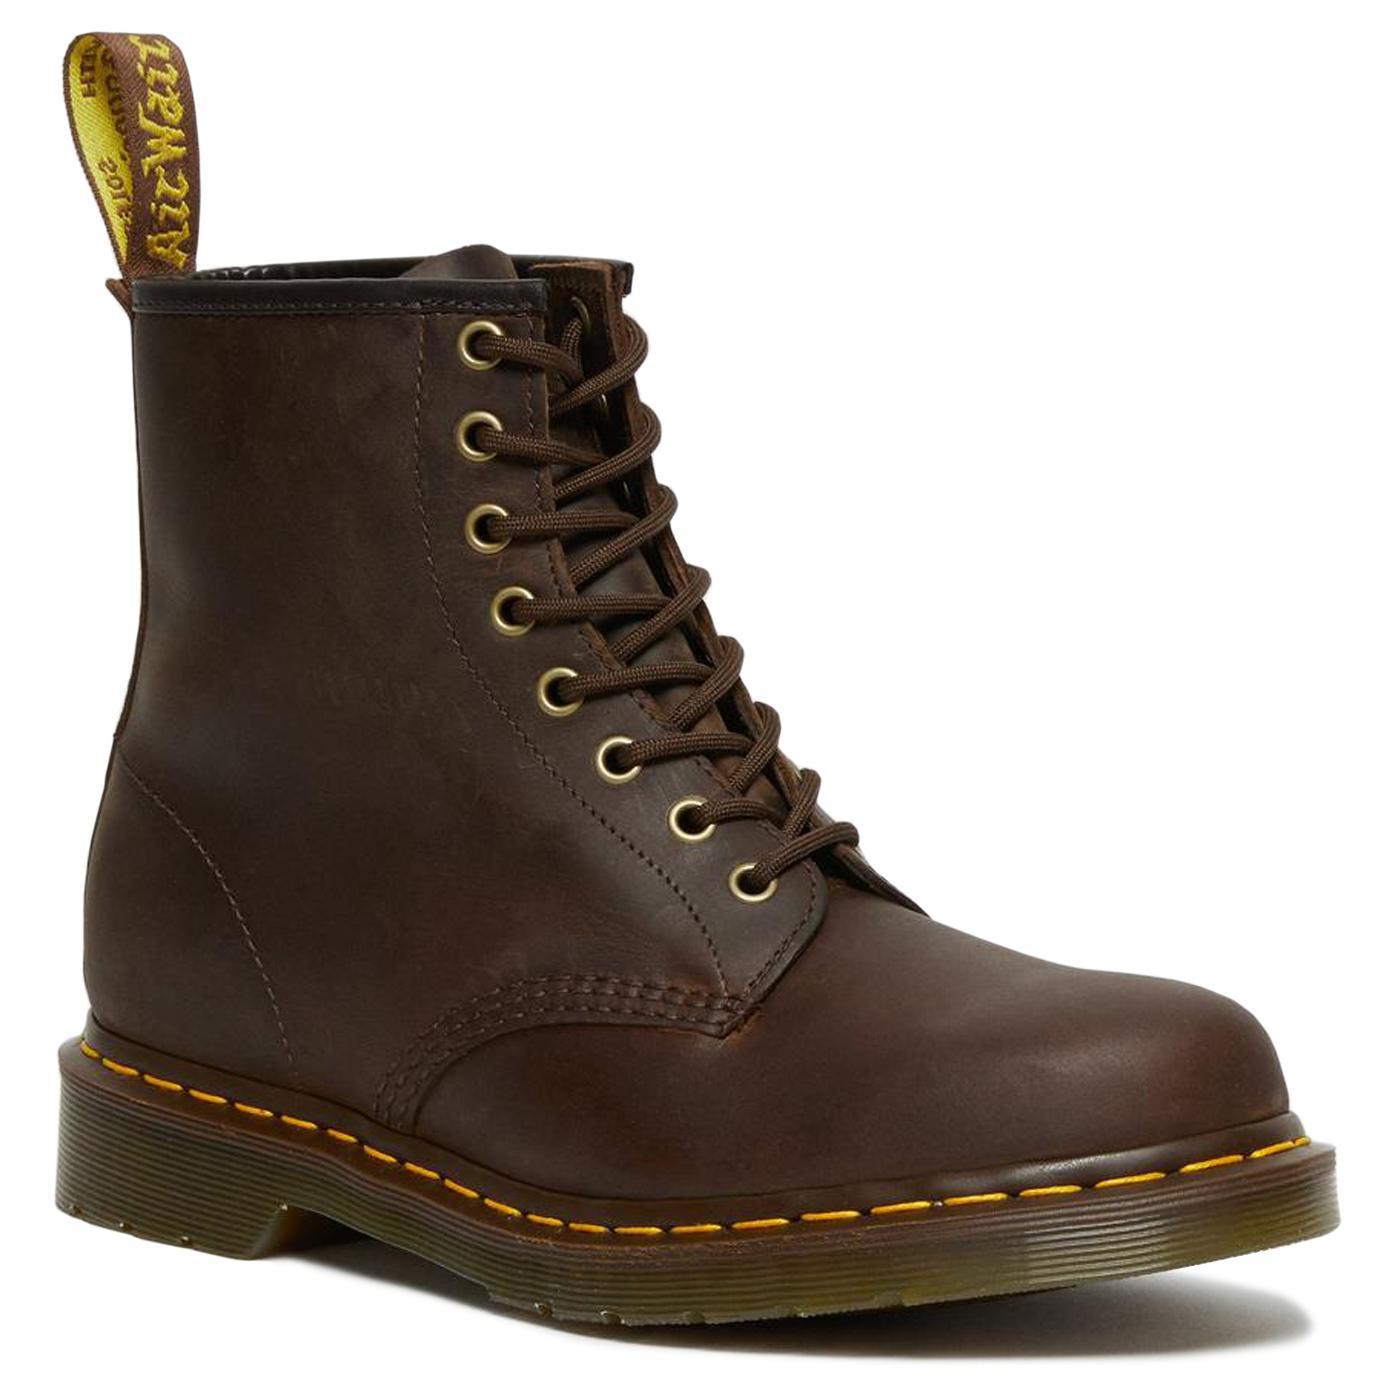 1460 Gaucho DR MARTENS Men's Leather Ankle Boots